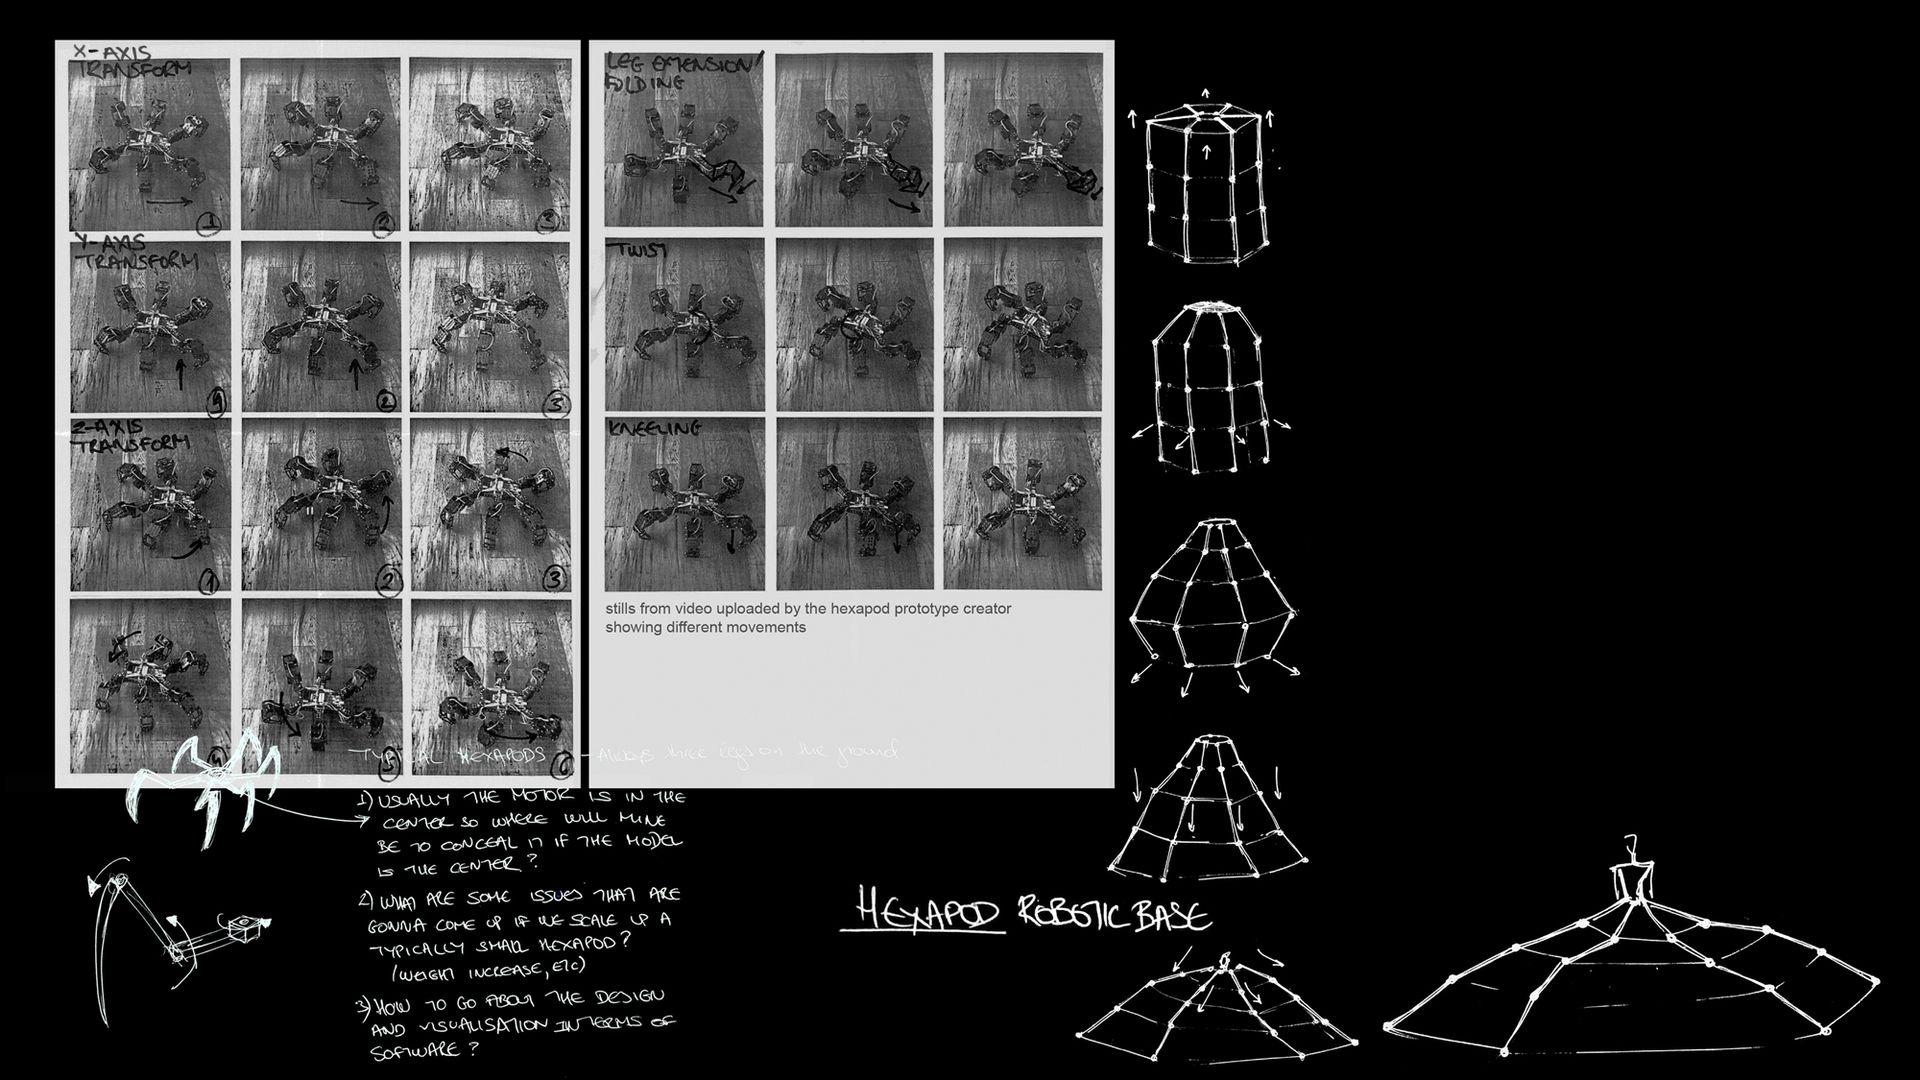 Fashion Post-Disciplinary Design: Dimitris Karagiannakis 2021